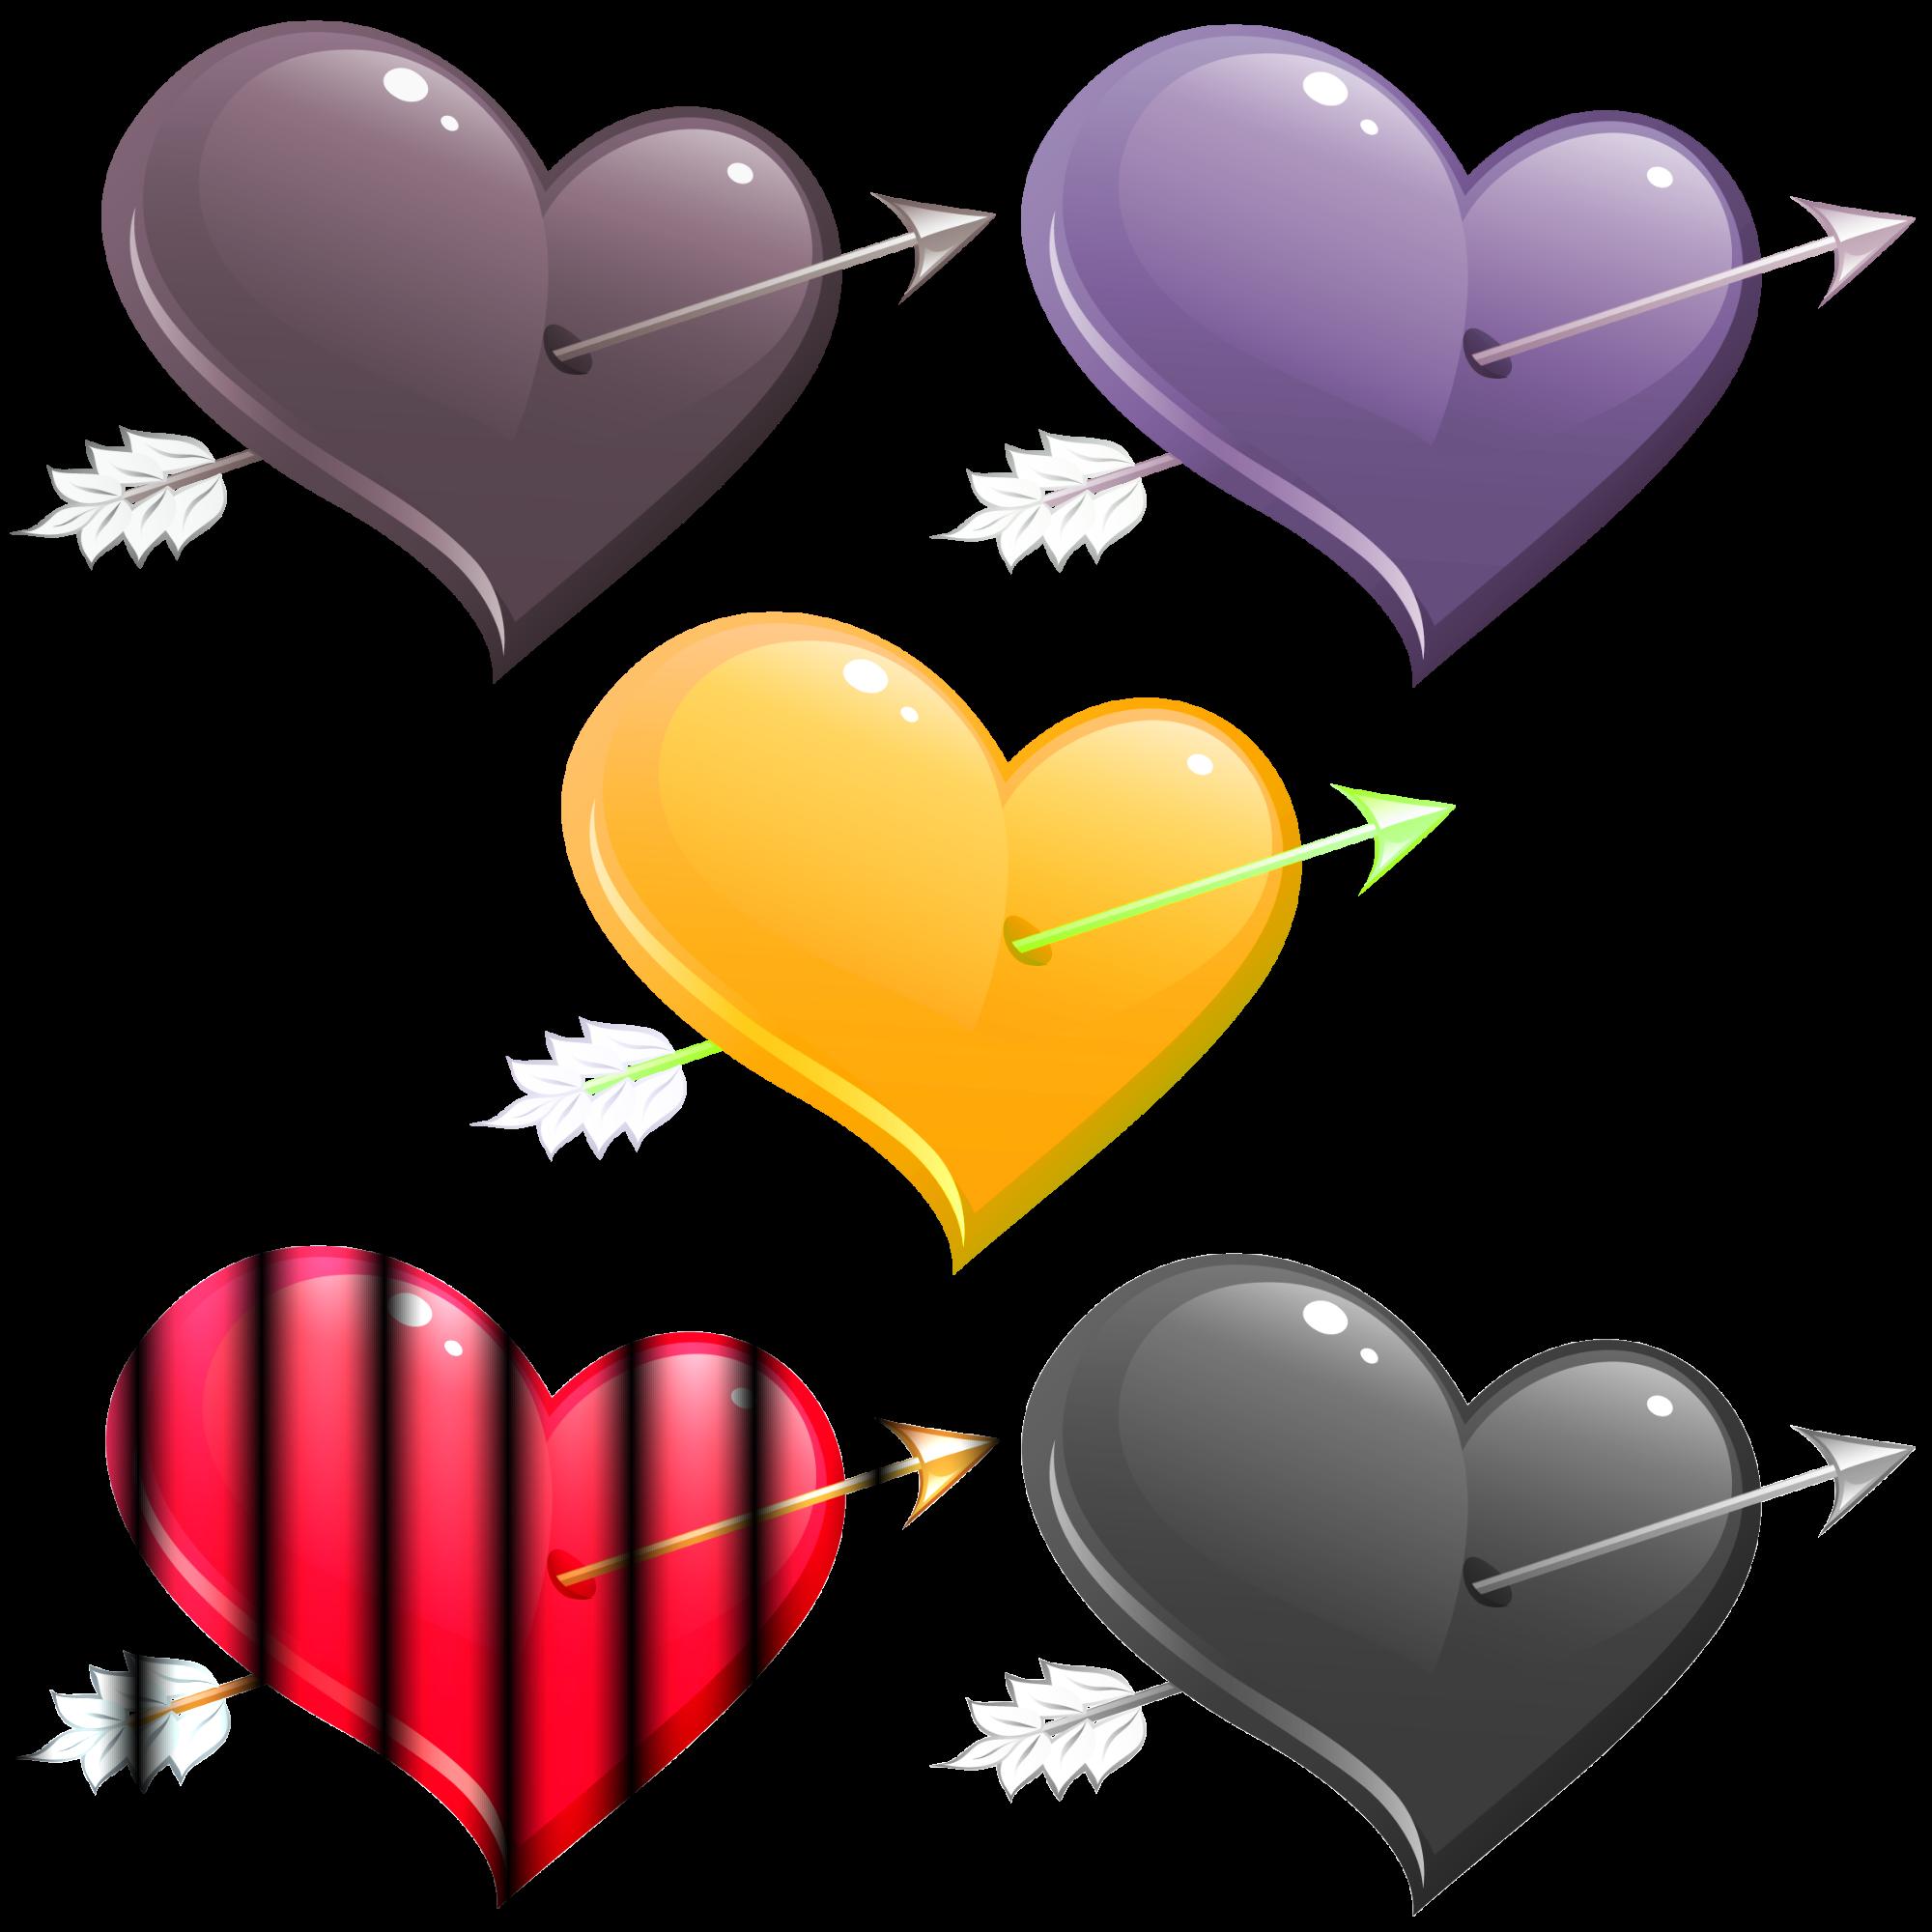 Infinity heart clipart jpg black and white download Clipart heart | Heart clipart❤ | Pinterest | Heart and Infinity jpg black and white download